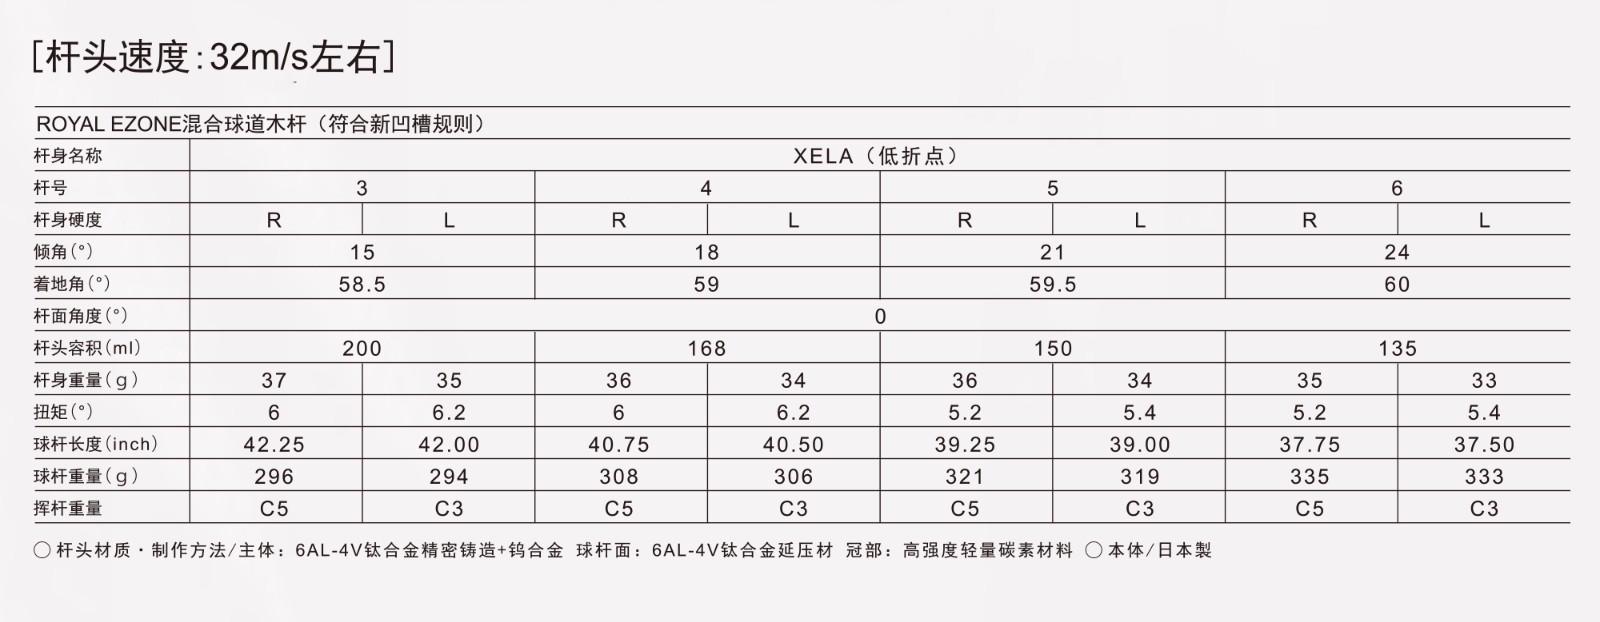 Royal EZONE 球道木.jpg